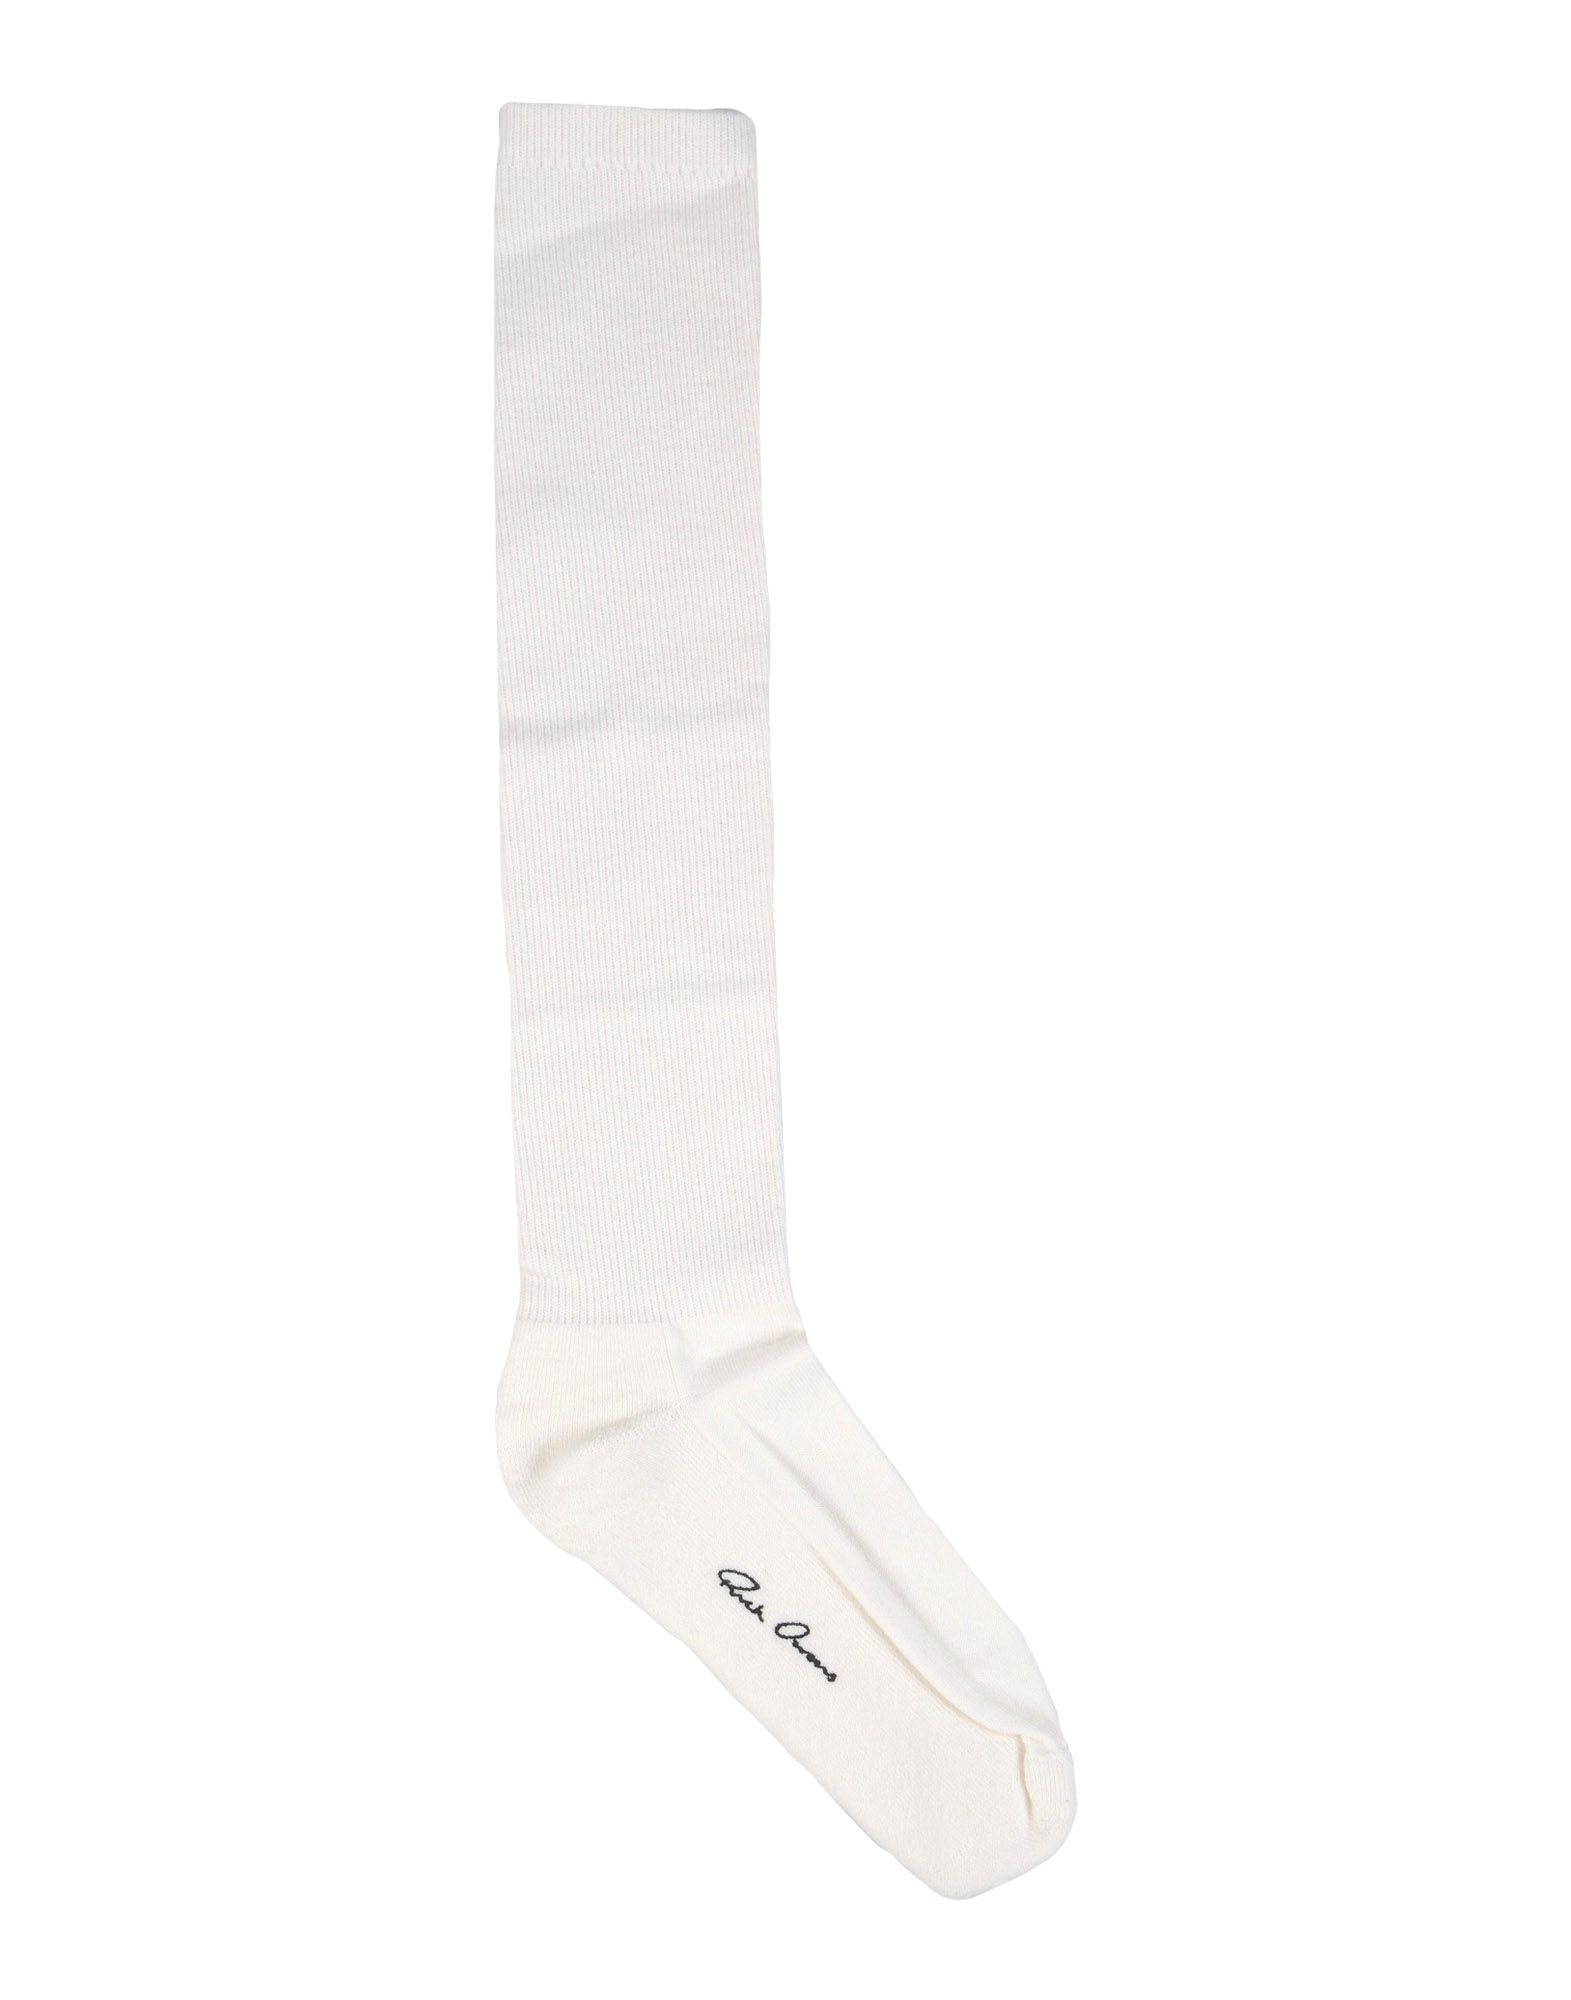 Rick Owens Socks